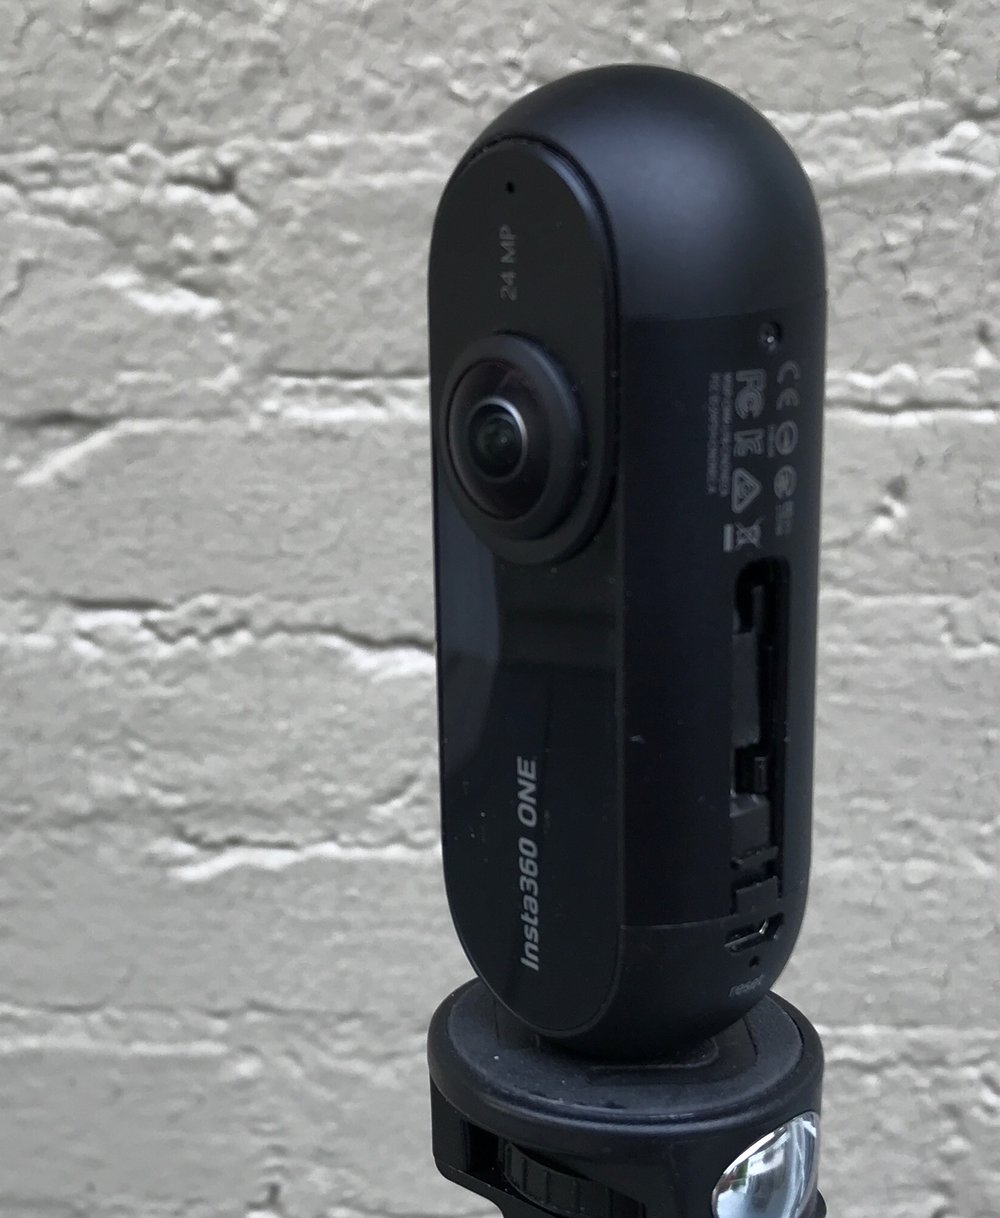 Insta360 One 360° camera